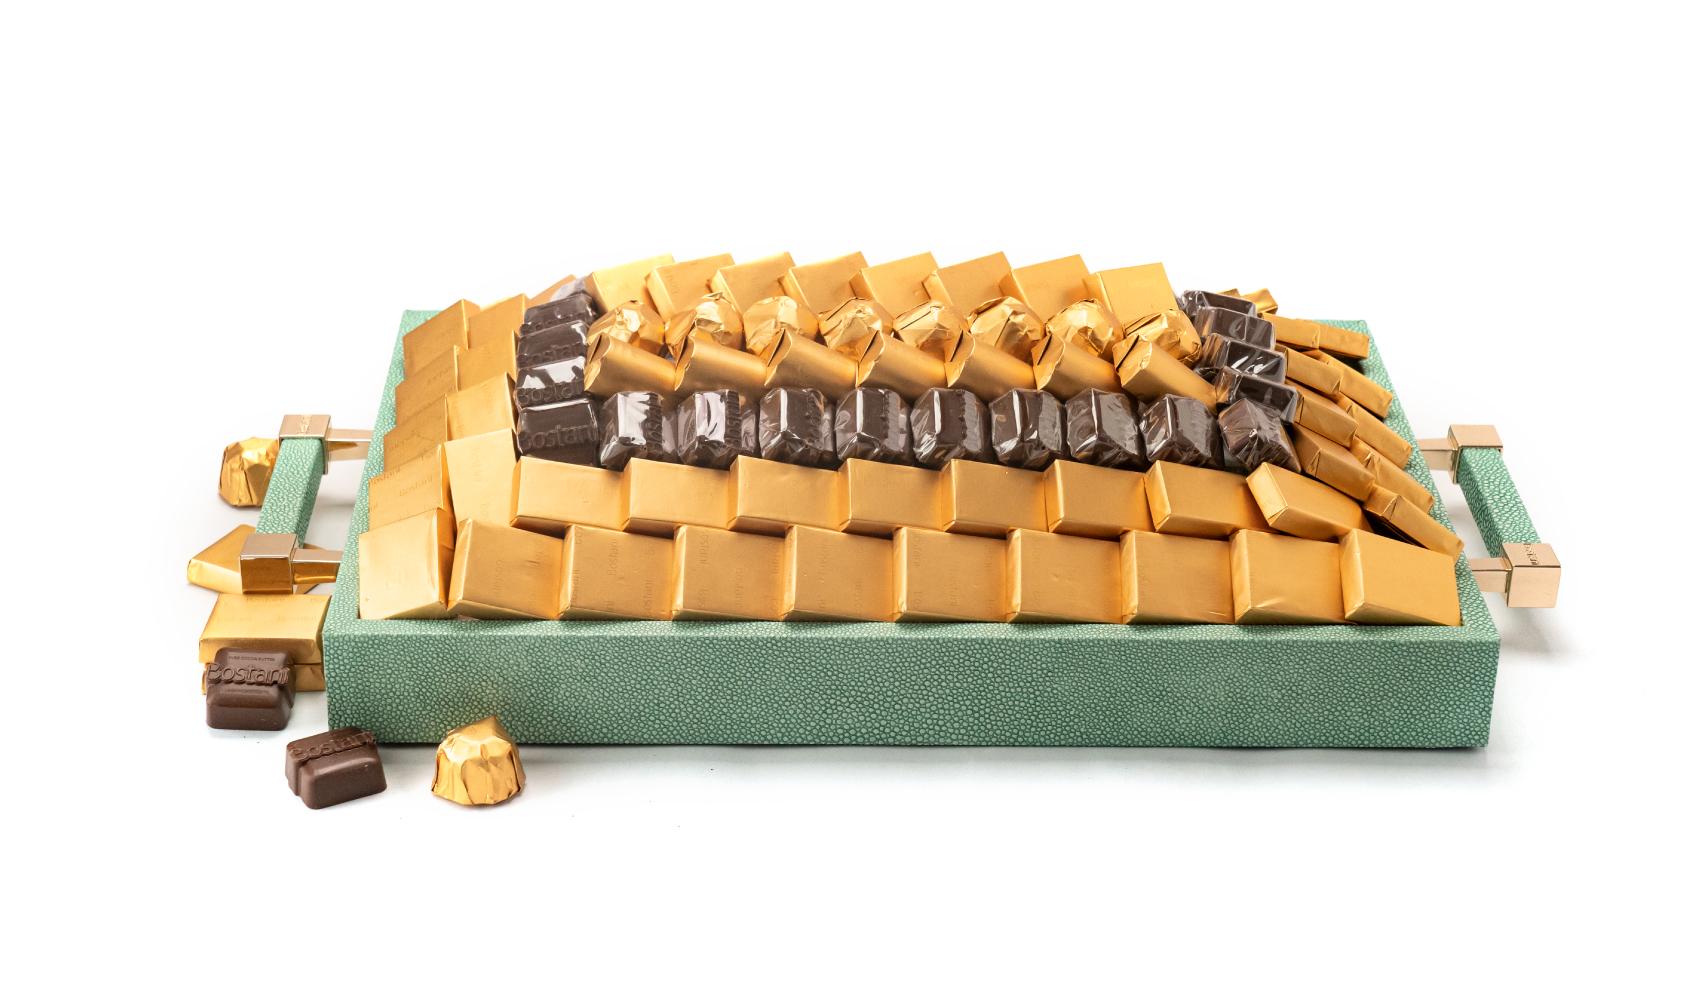 Leatherd Tray Tiffany Small Mix Chocolate